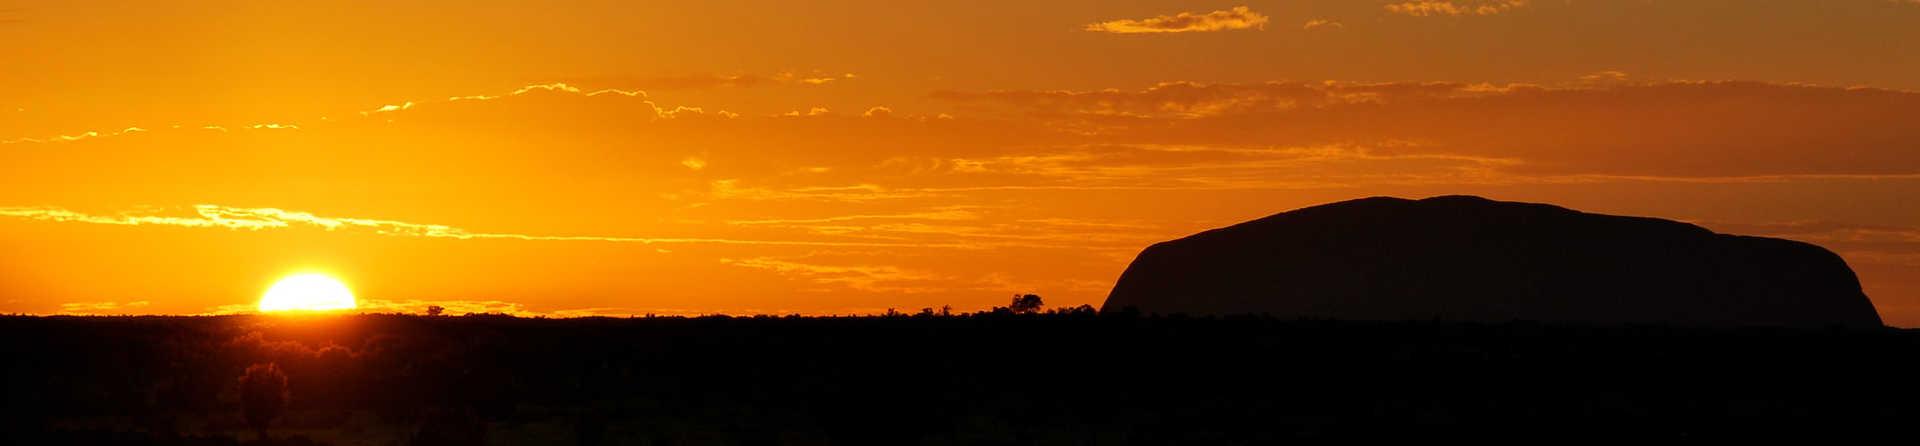 Is Uluru better at sunrise or sunset?